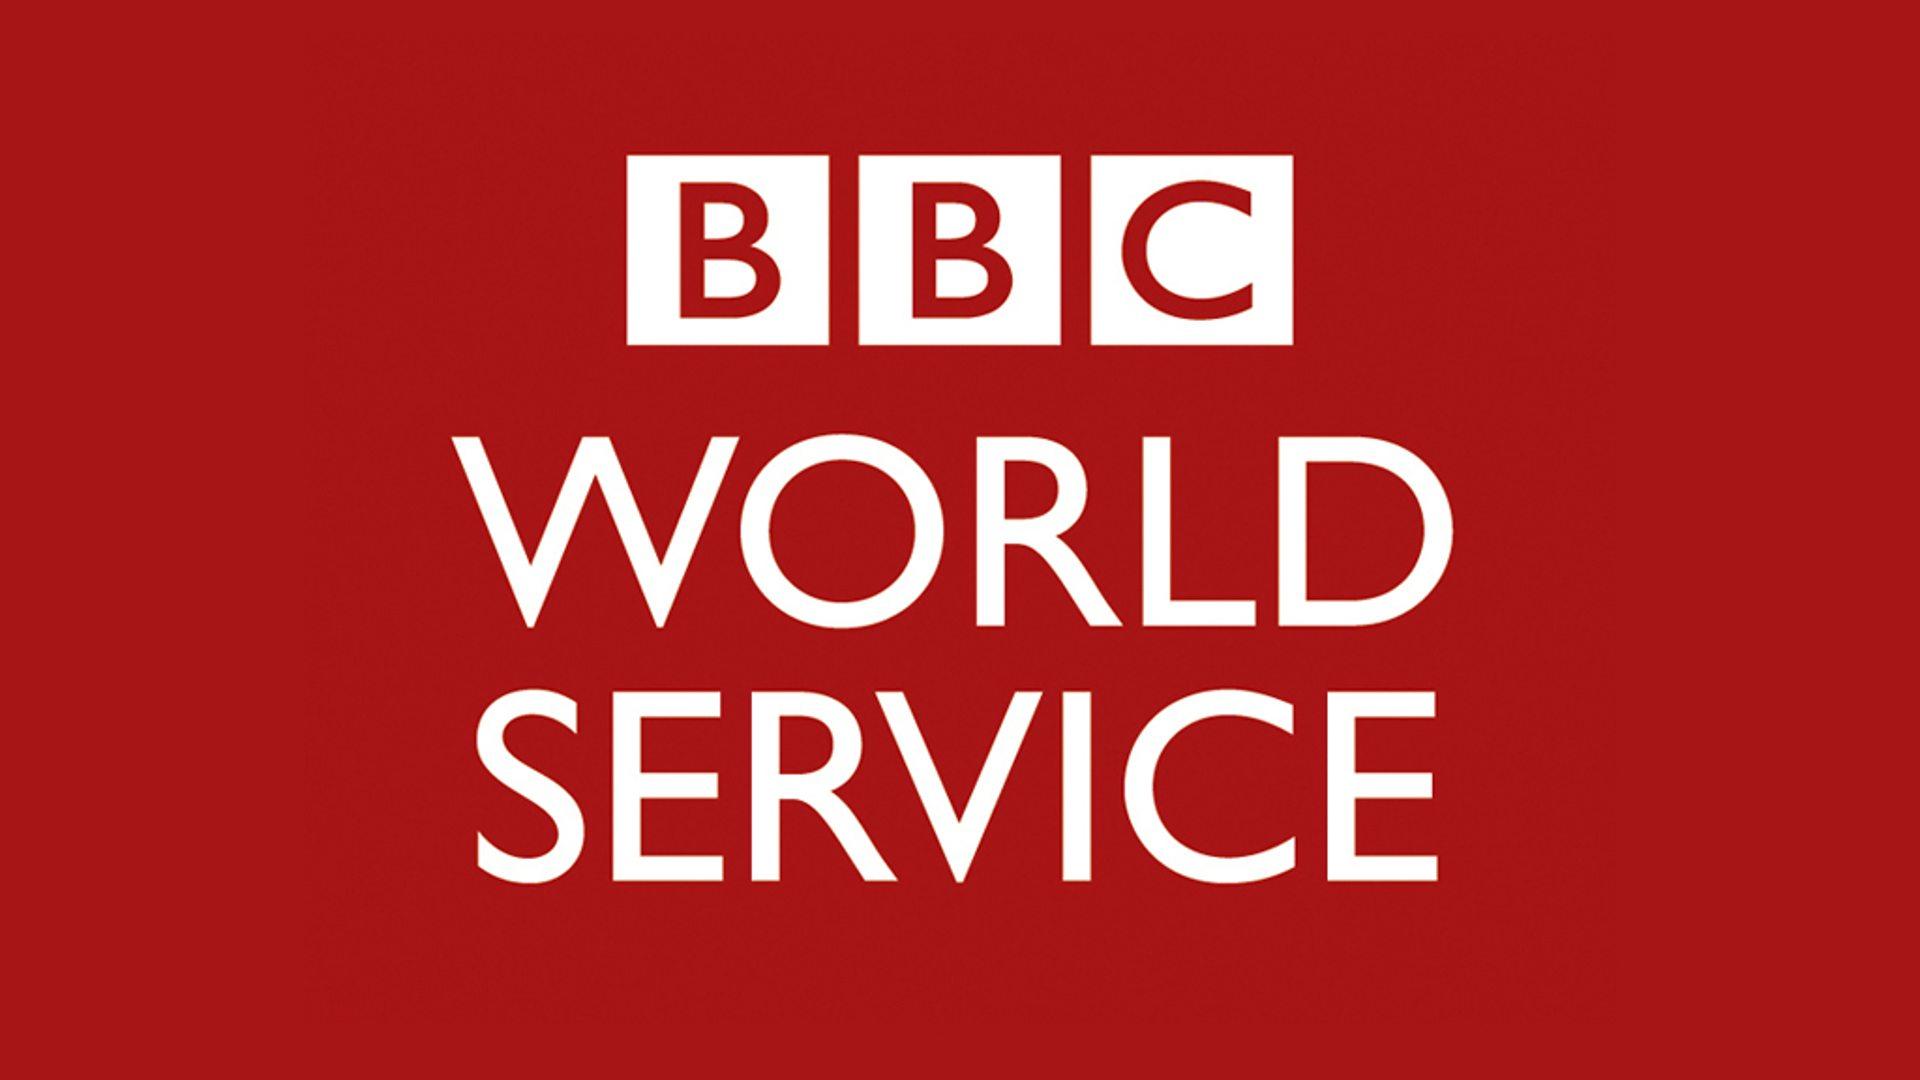 bbc world service.jpg